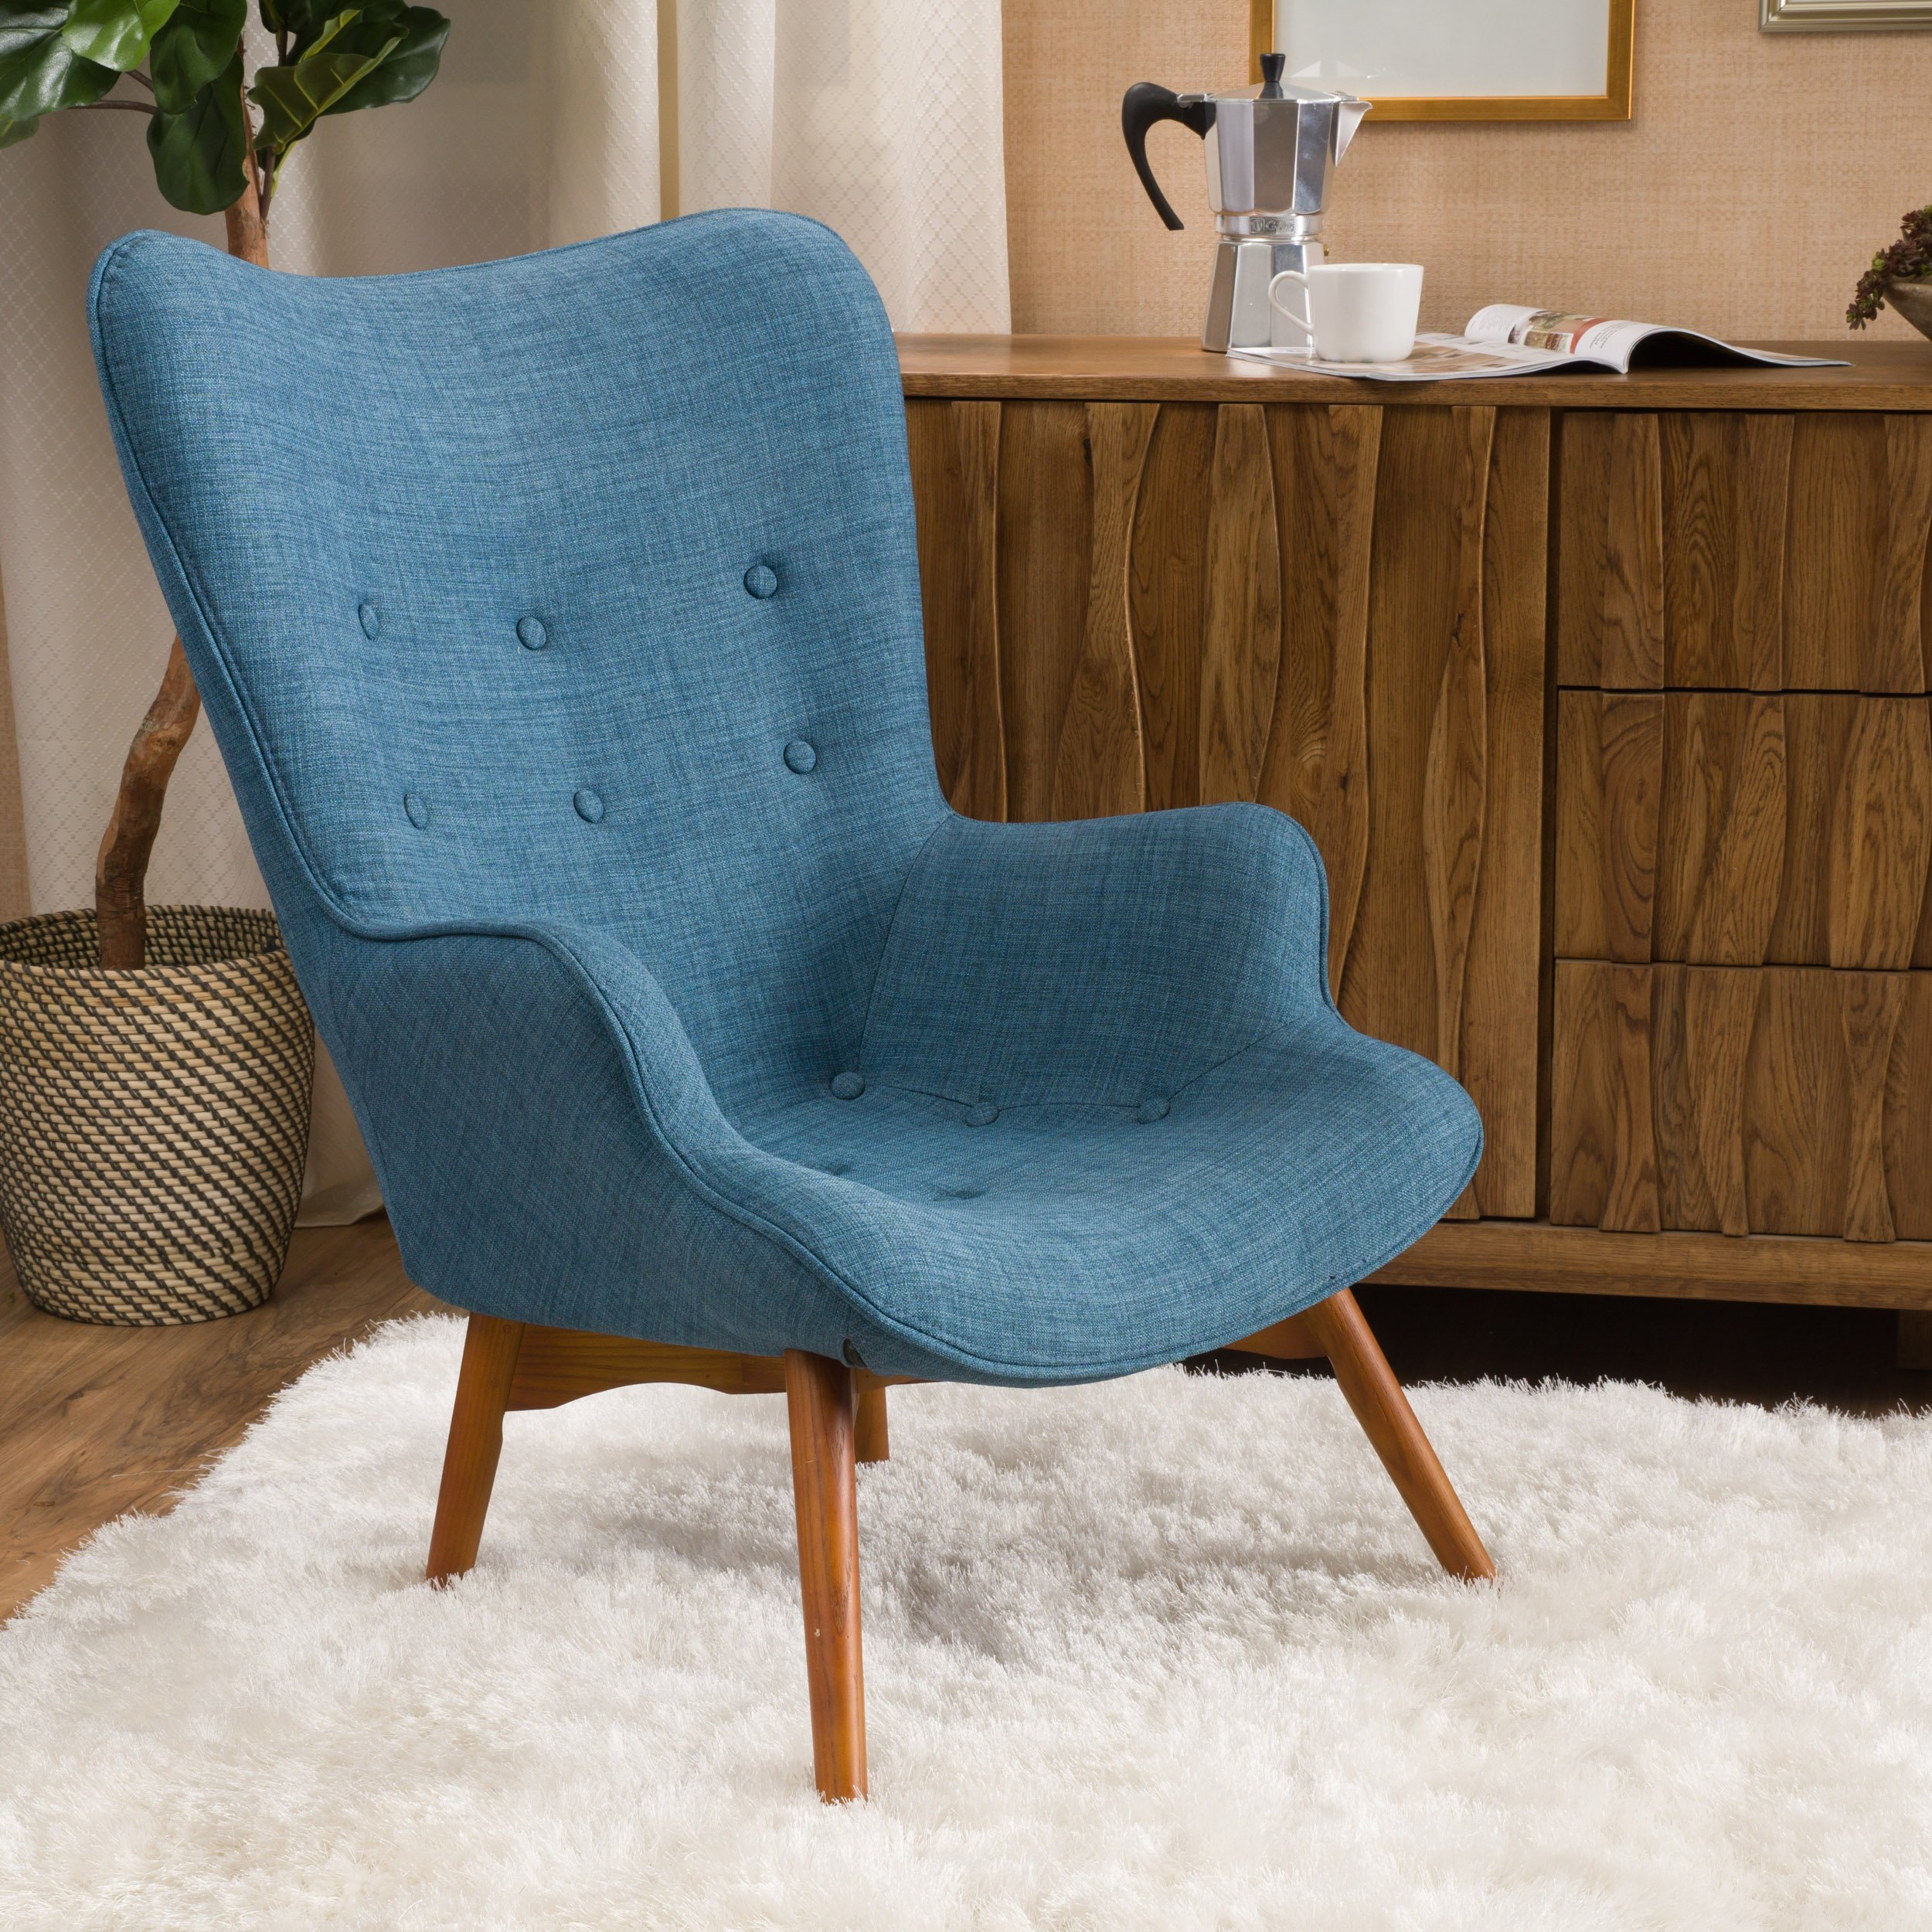 Christopher Knight Home Hariata Arm Chair, Muted Blue by Christopher Knight Home